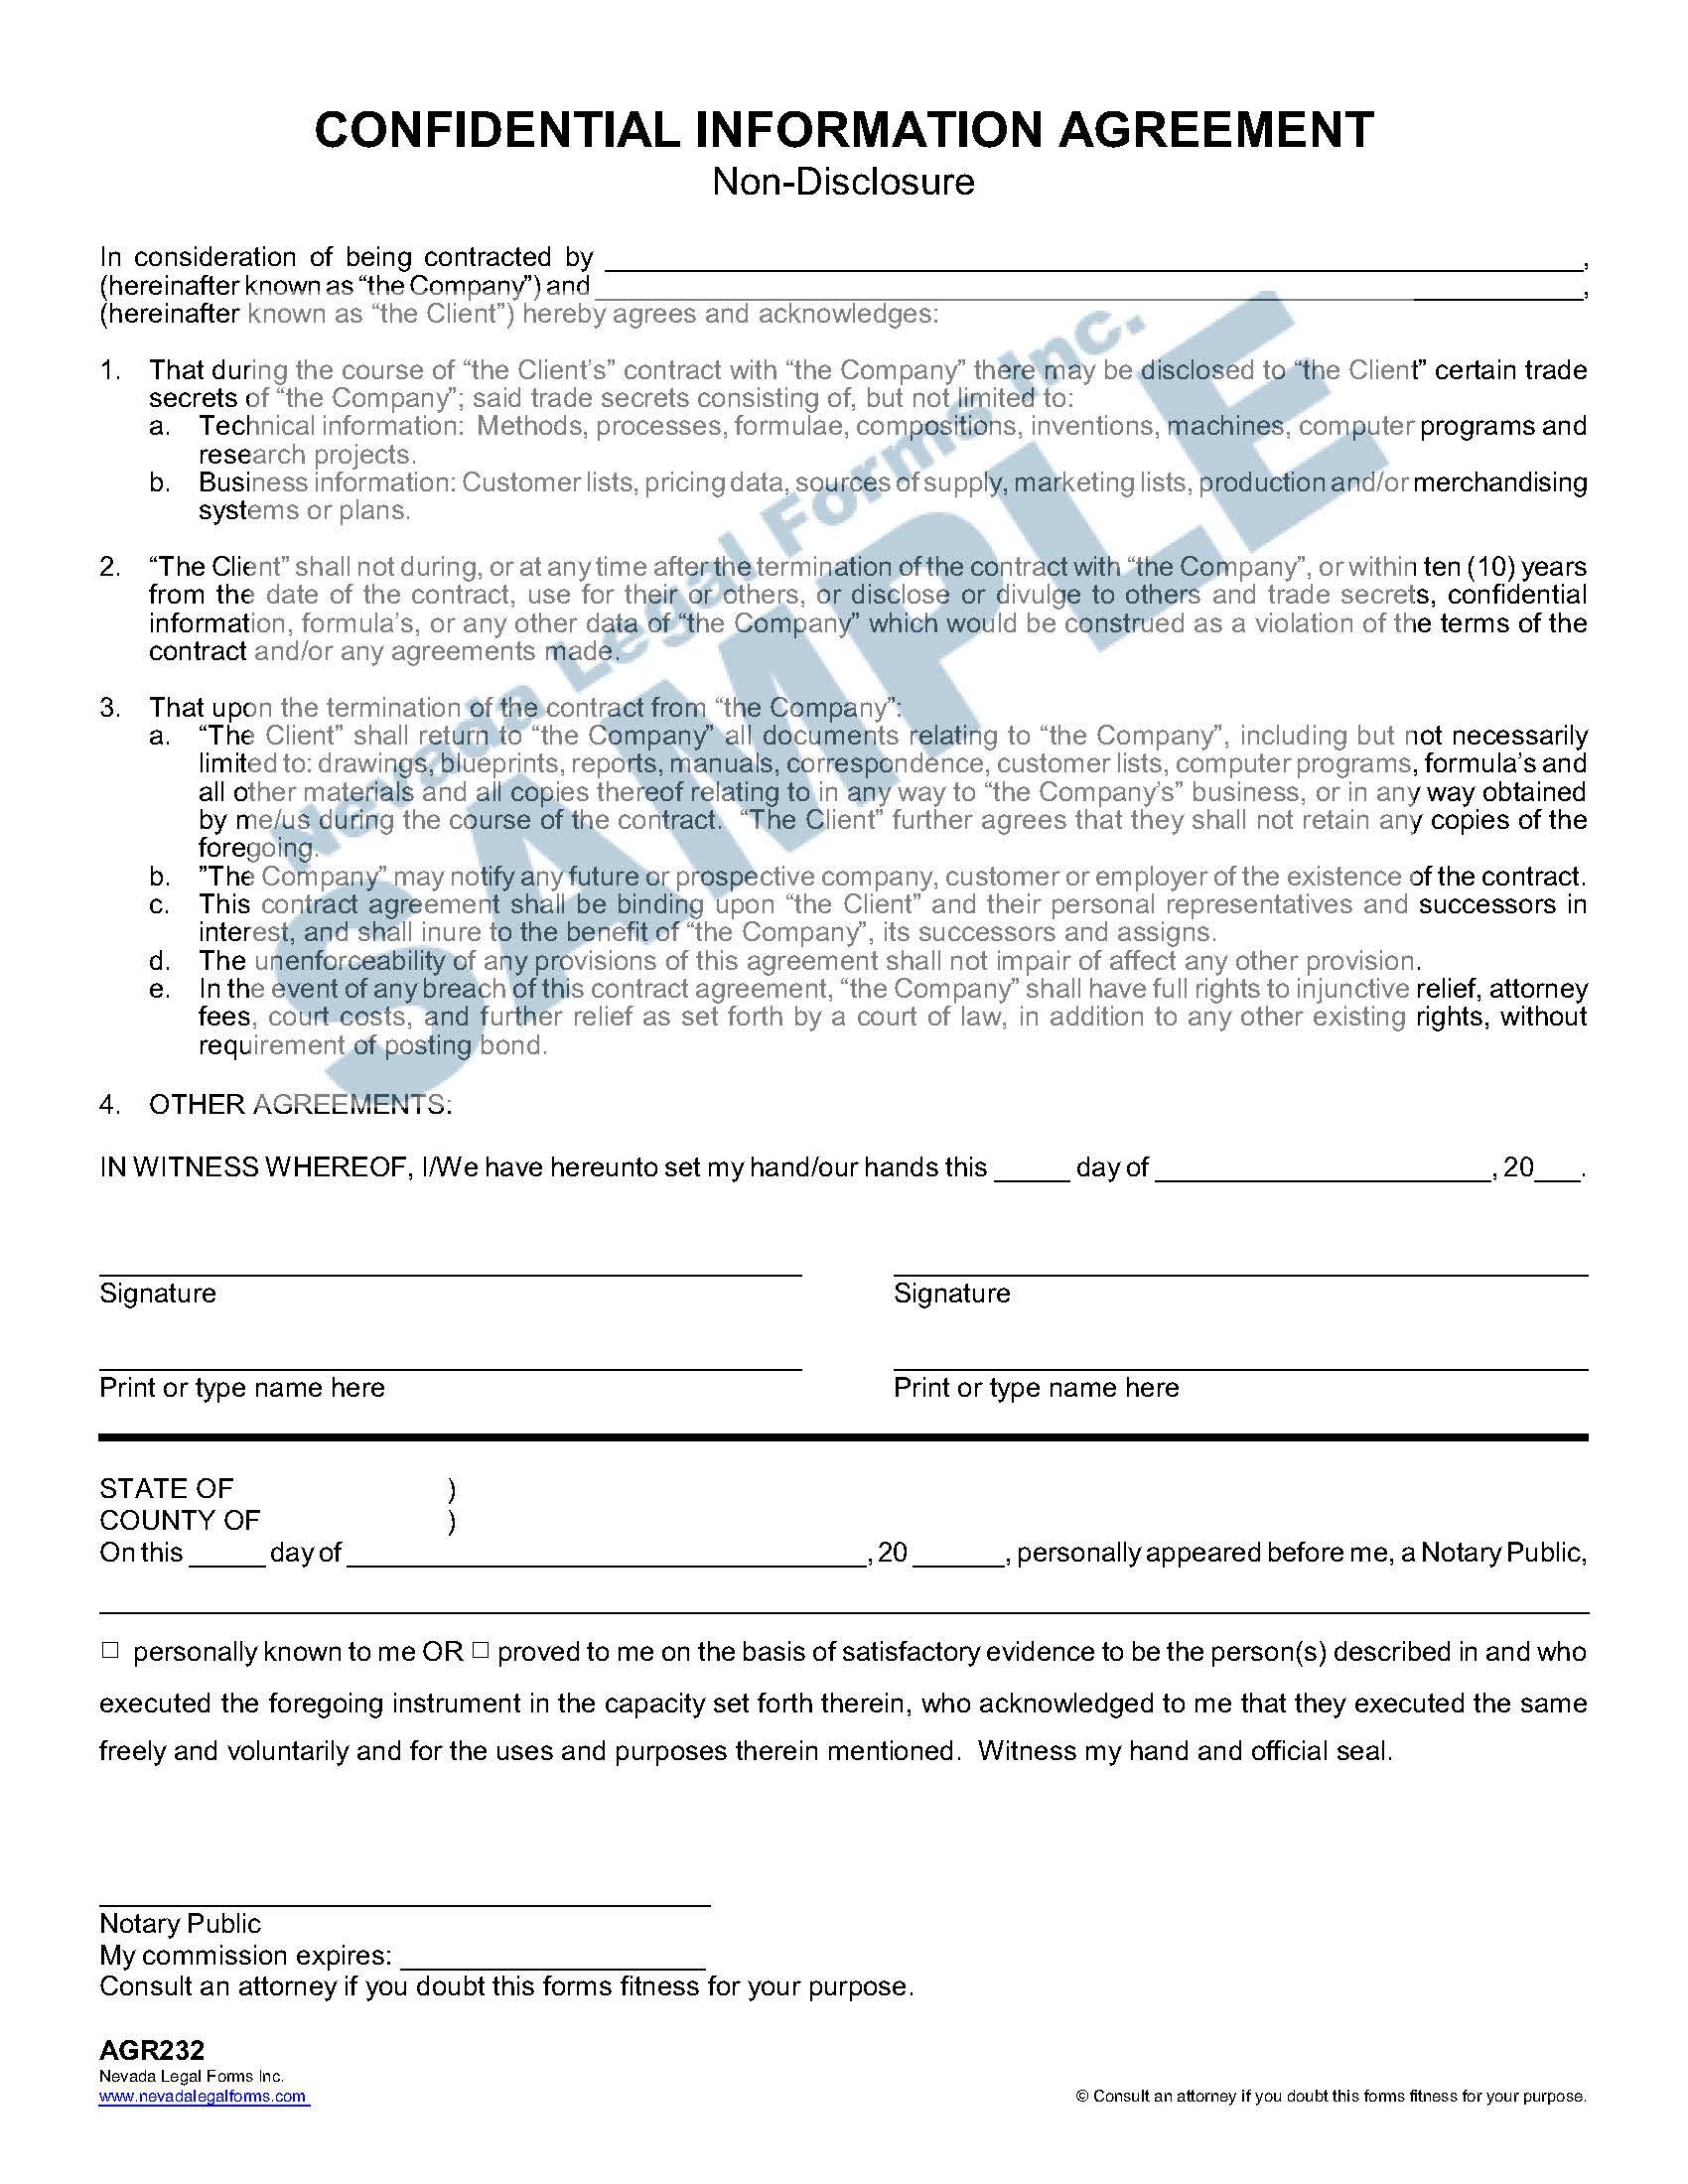 Confidential Information Agreement Non Disclosure